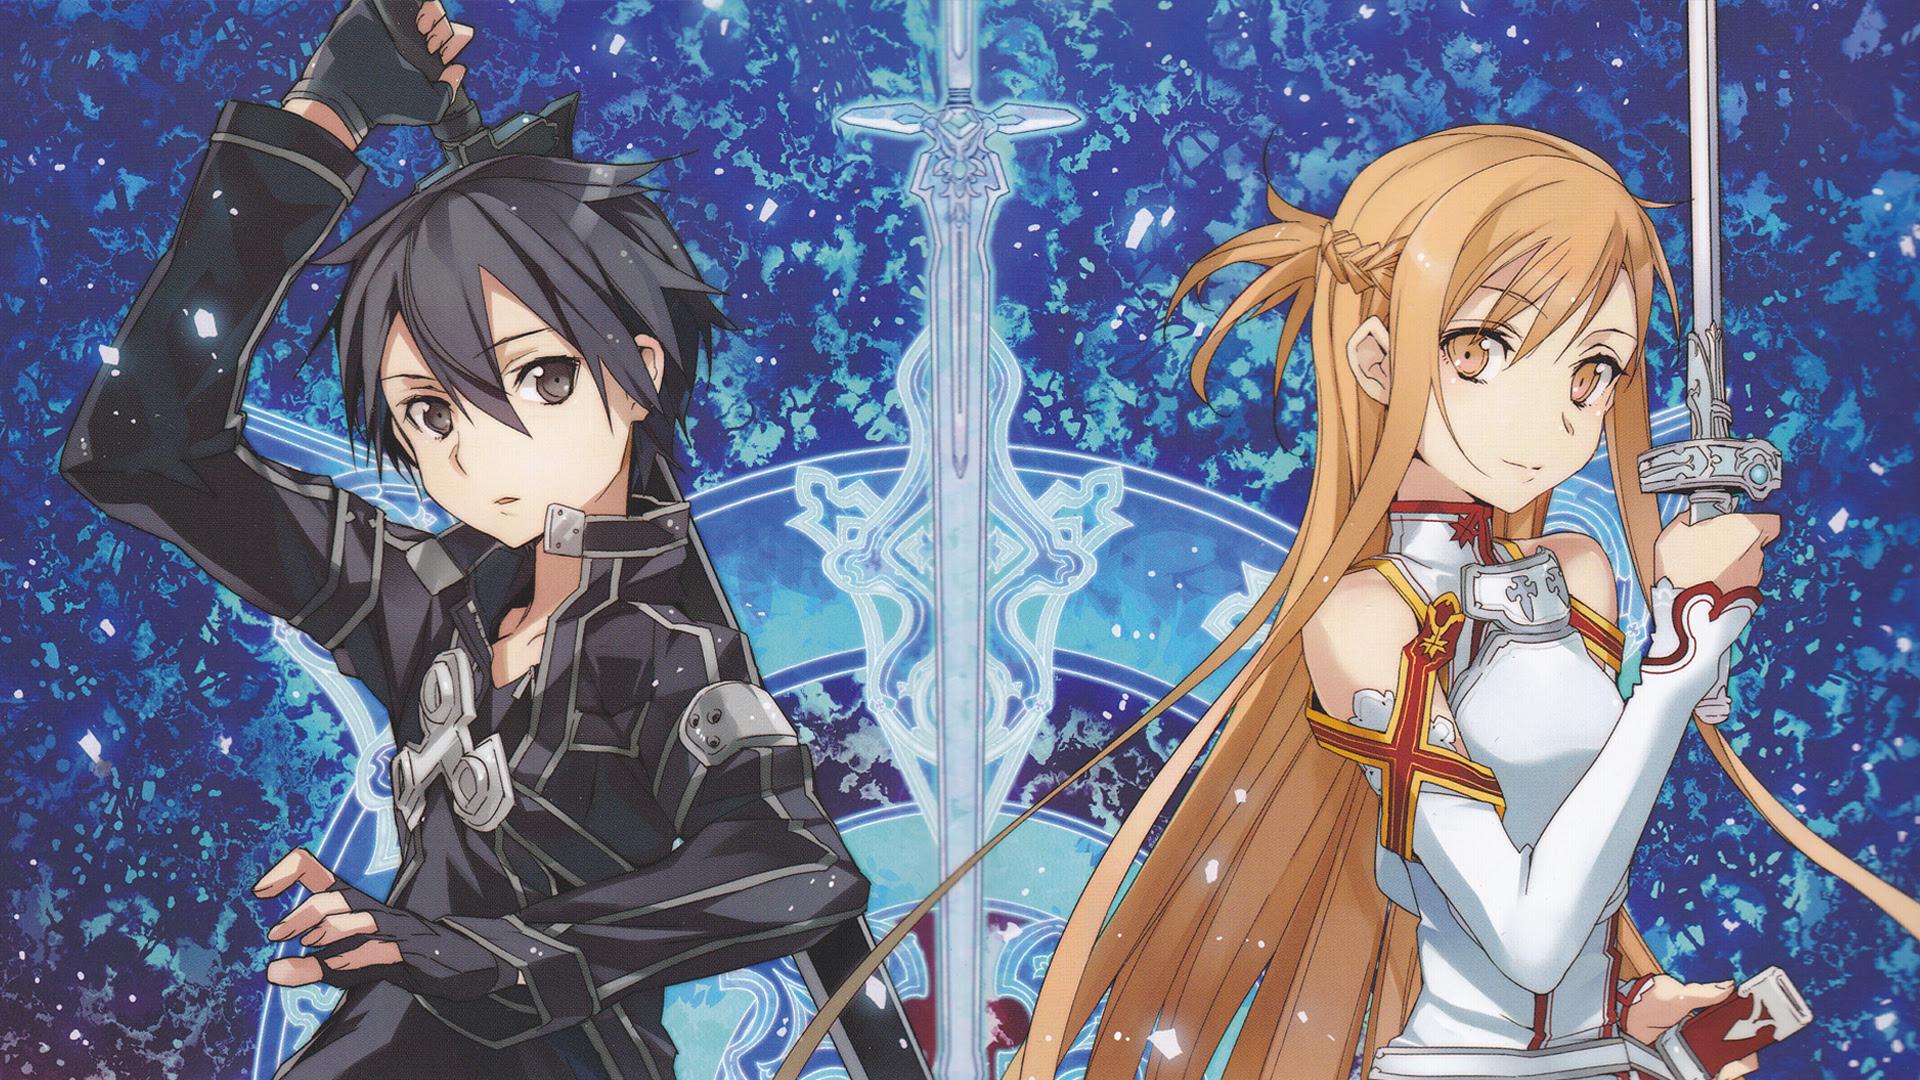 Sword Art Online Sword Art Online ファン 壁紙 34959027